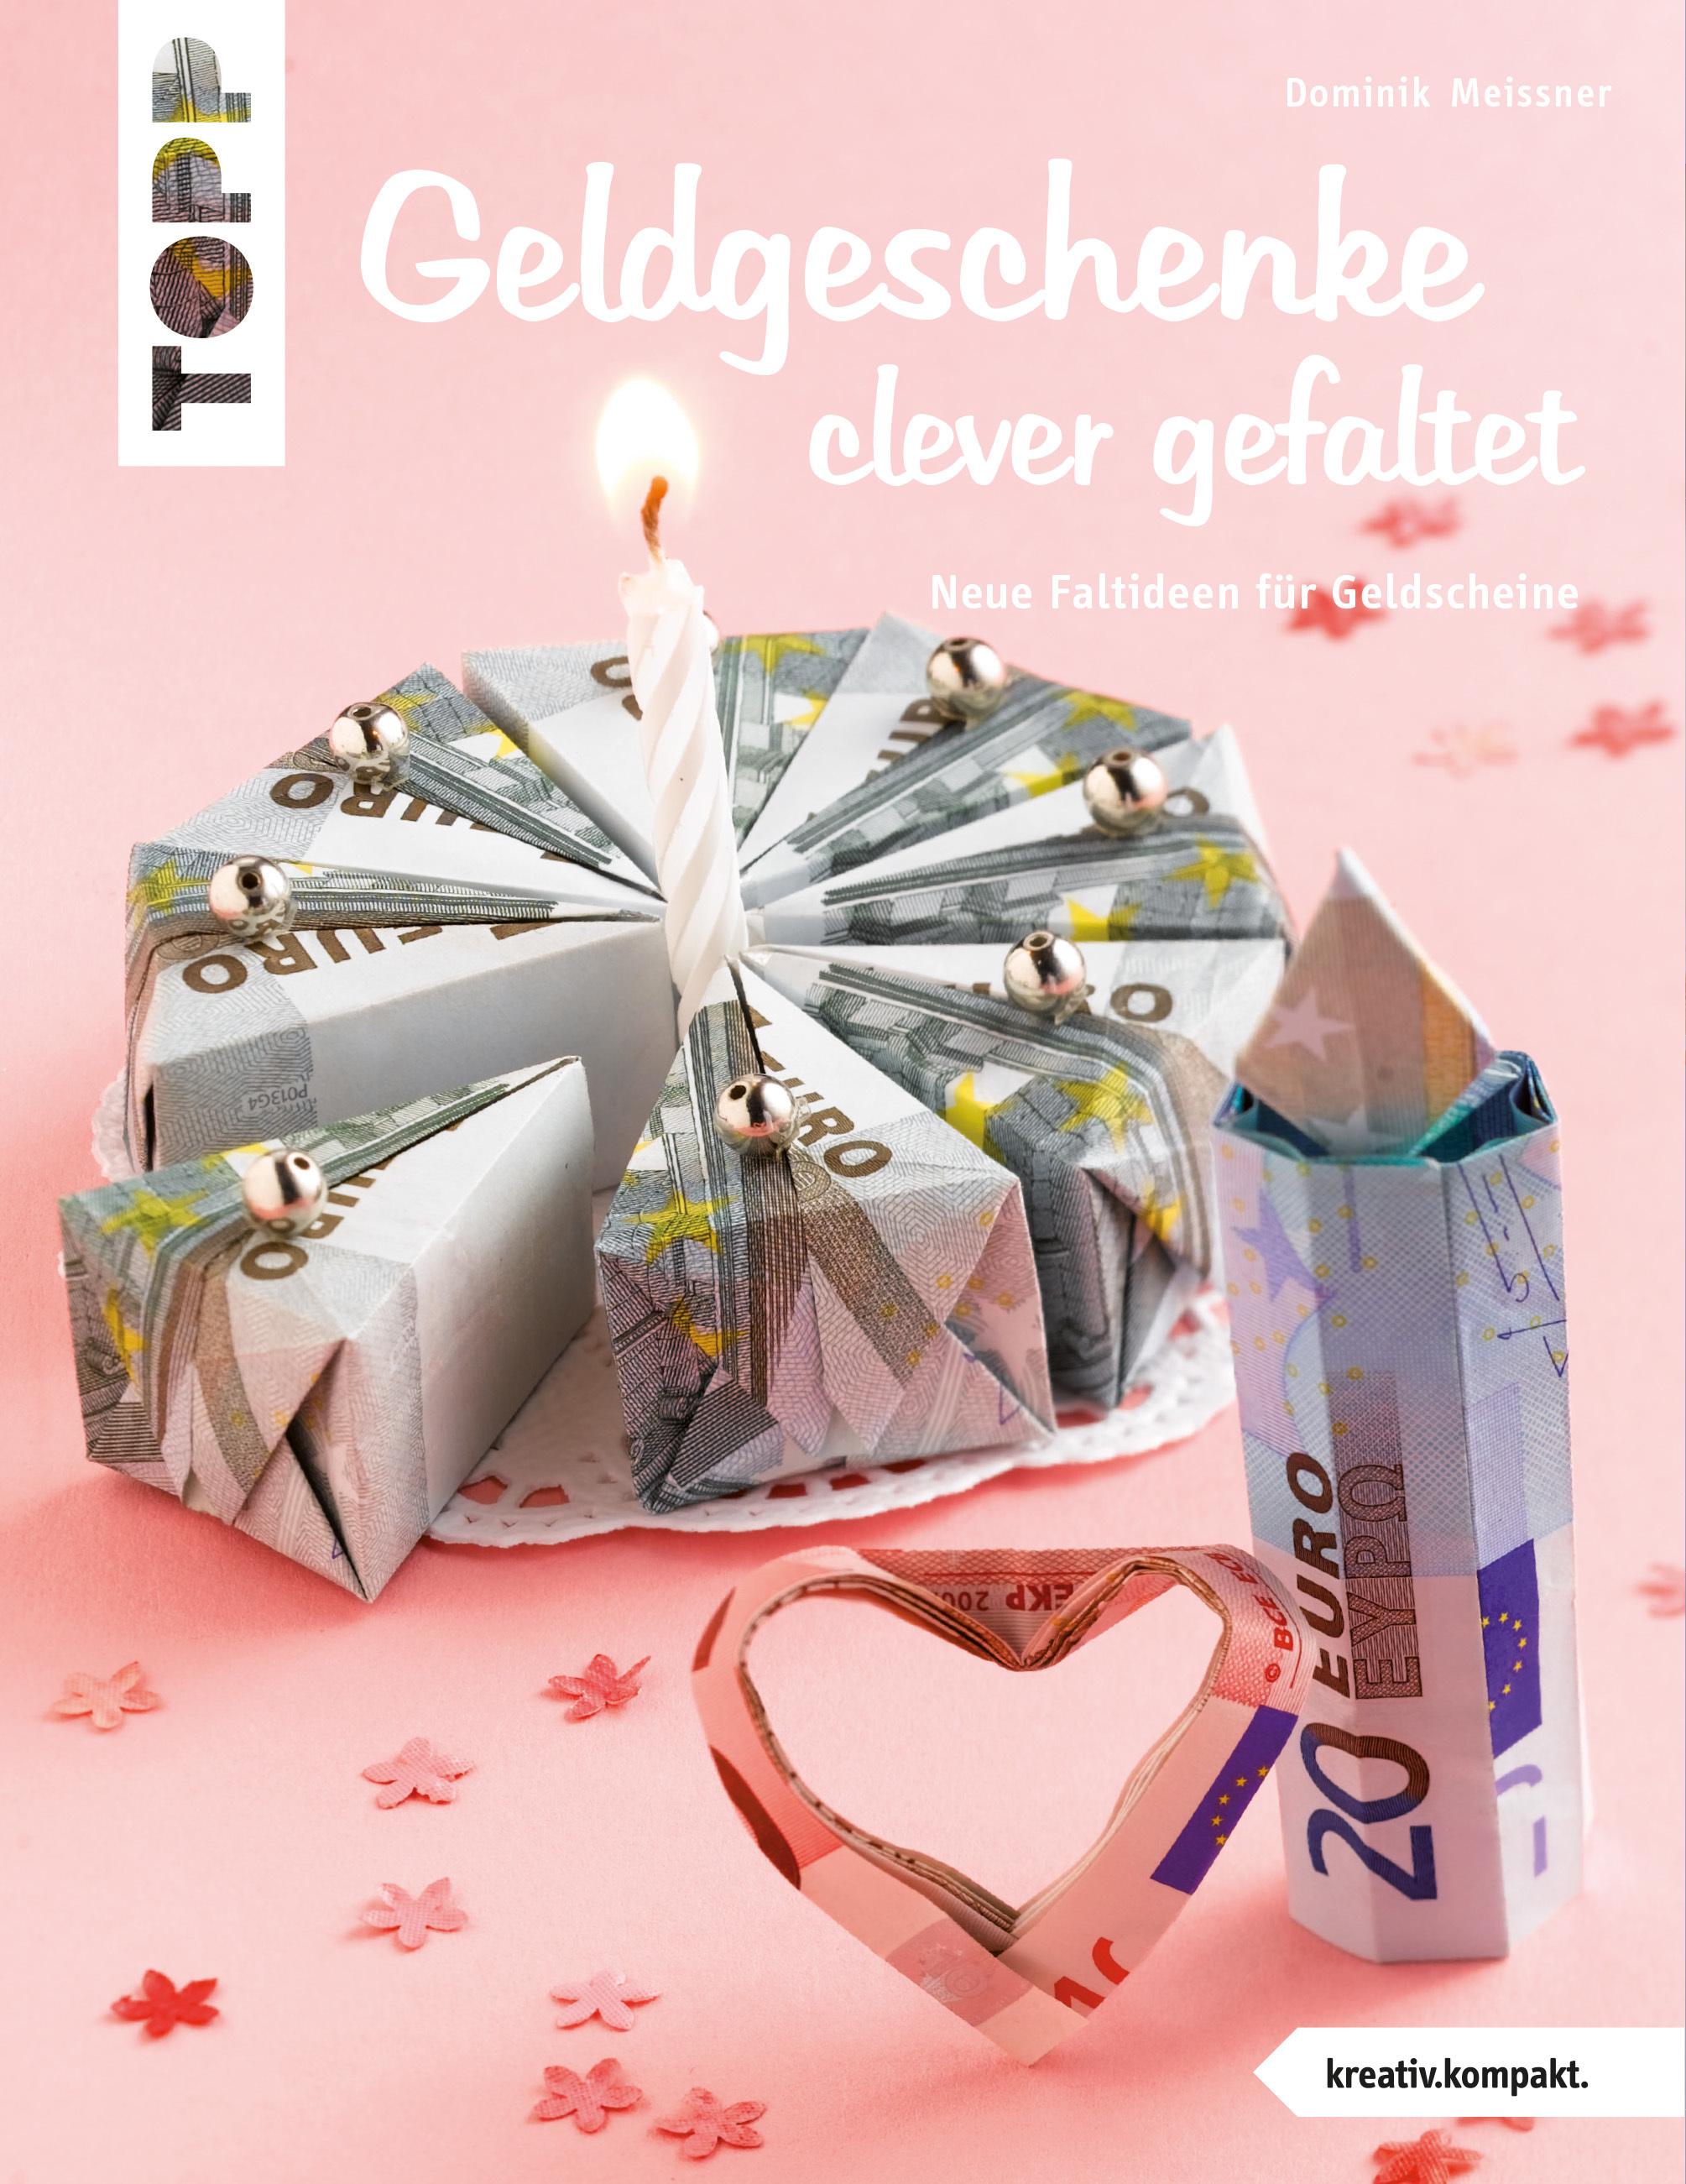 Geldgeschenke Clever Gefaltet Geldgeschenke Topp Kreativ De